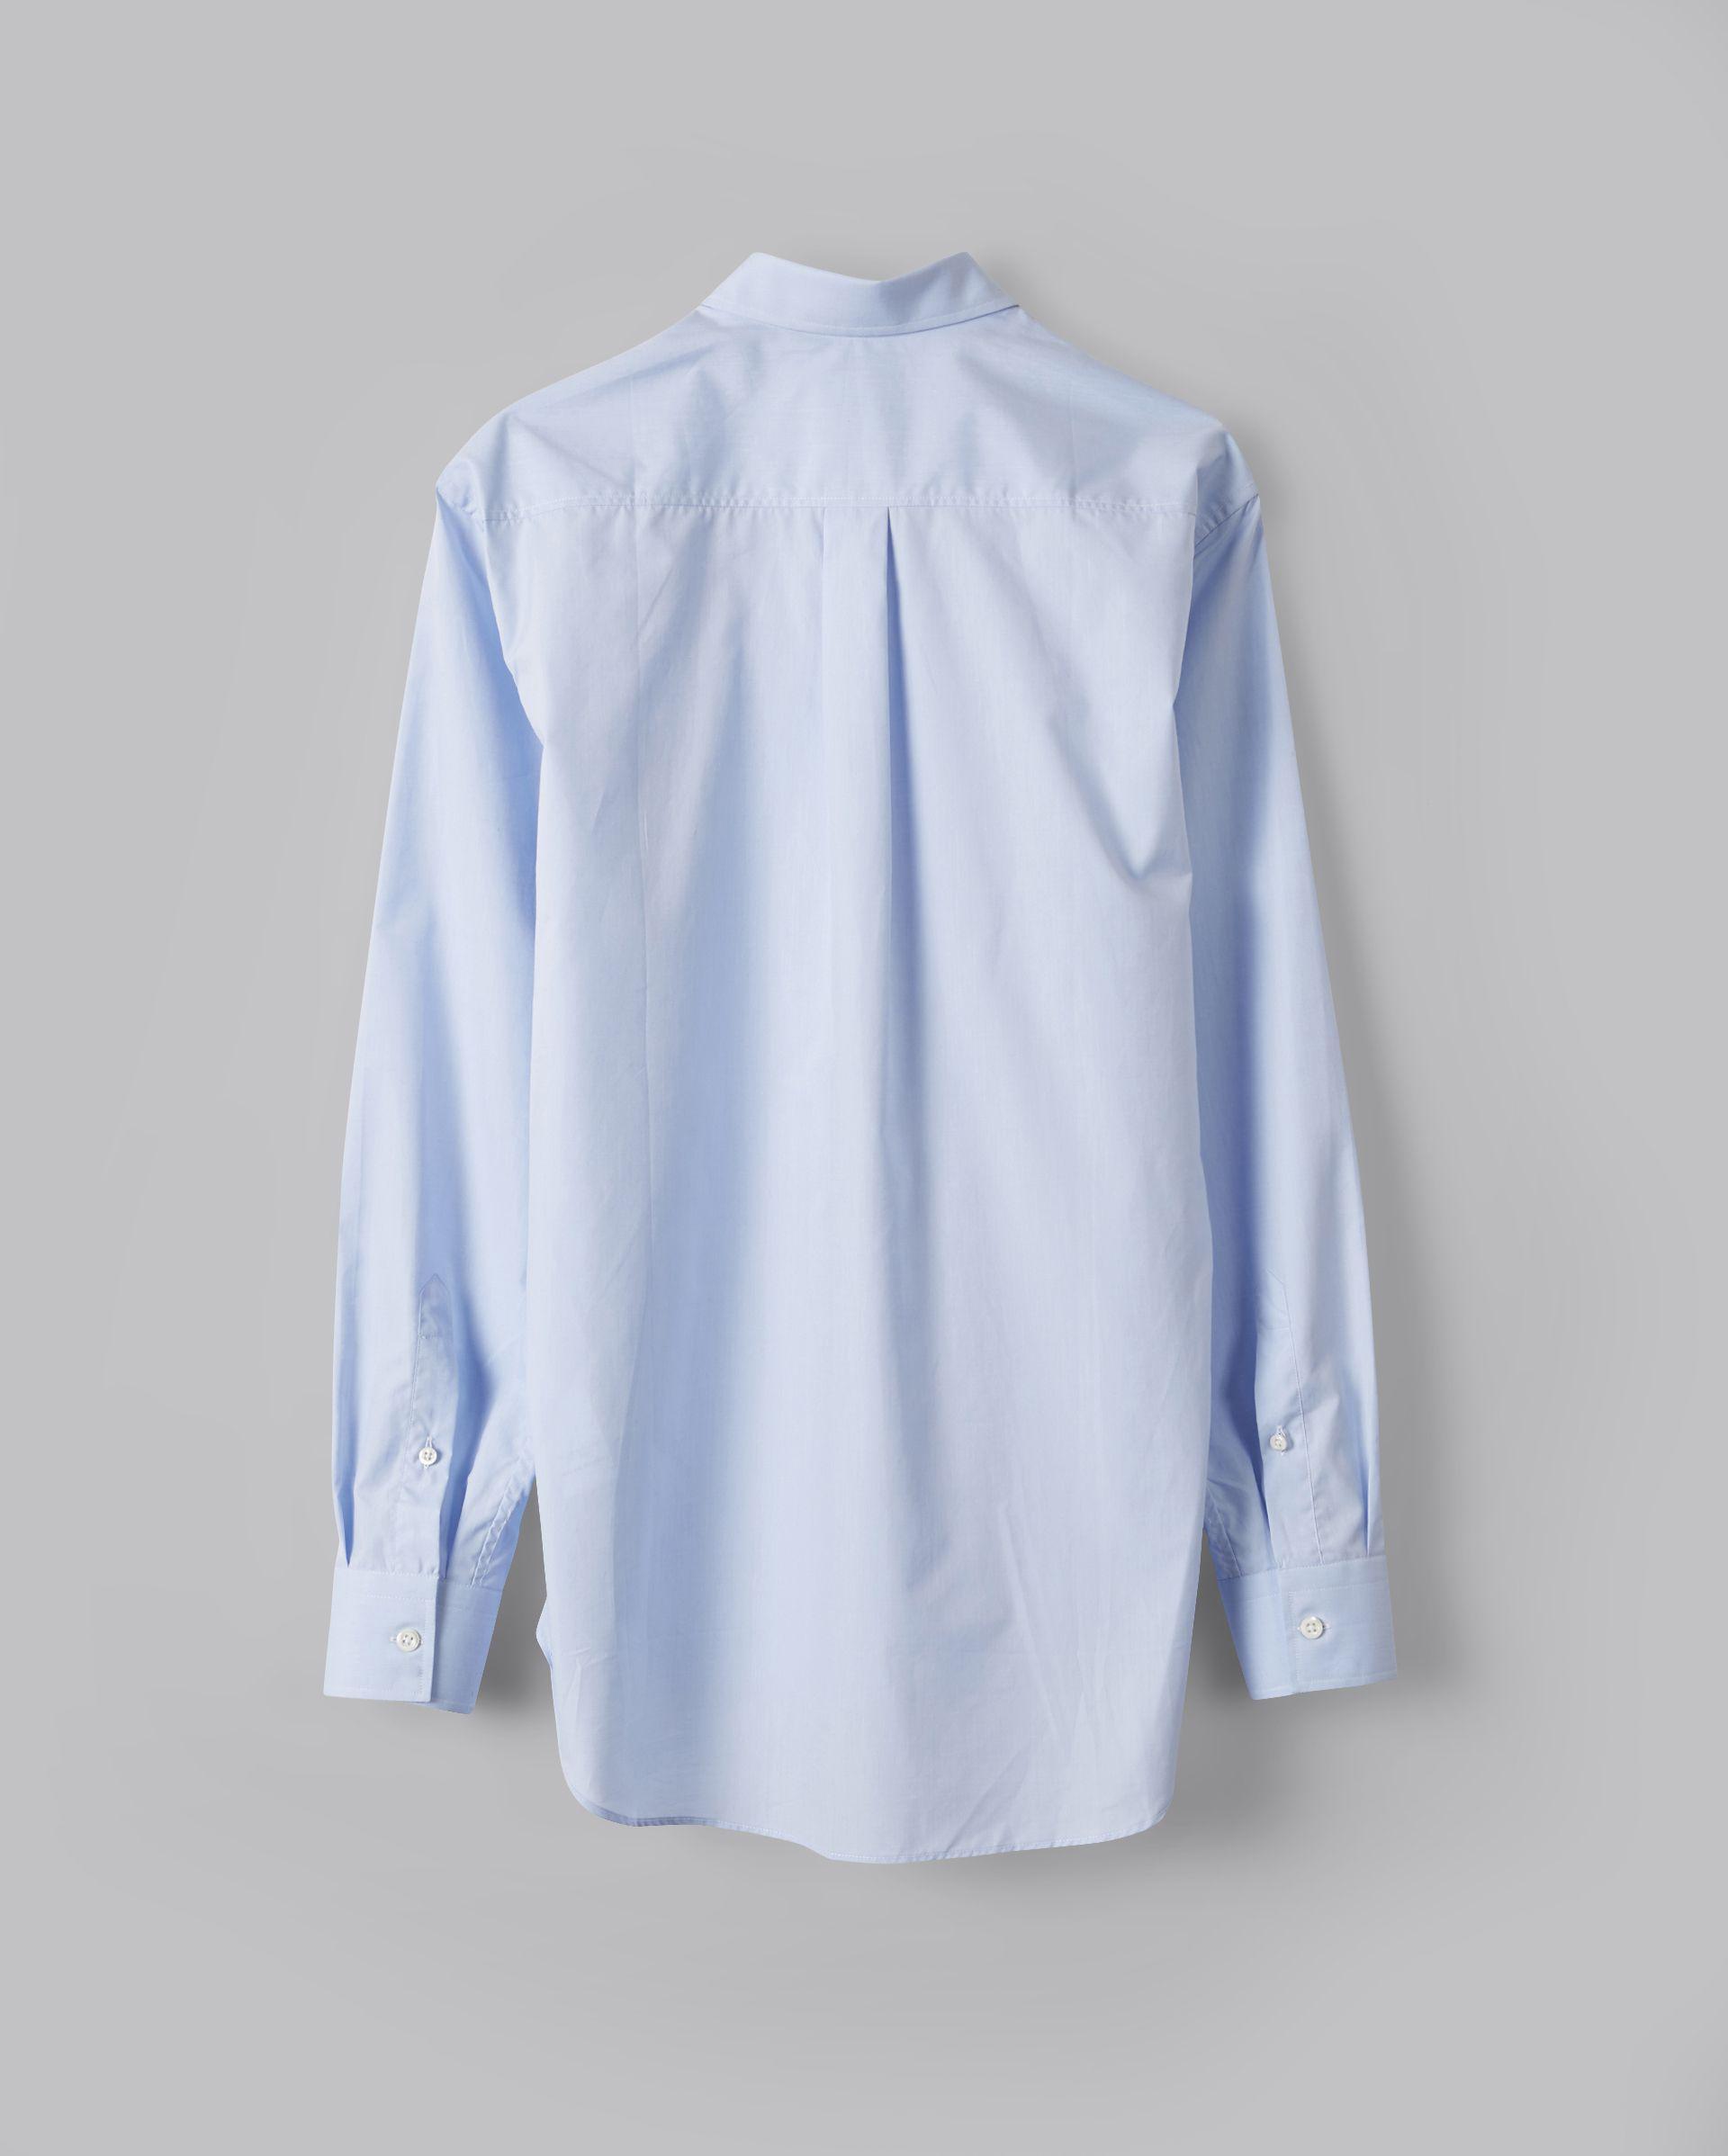 Billy Reid Sea Island Cotton Holt Dress Shirt In Blue For Men Lyst